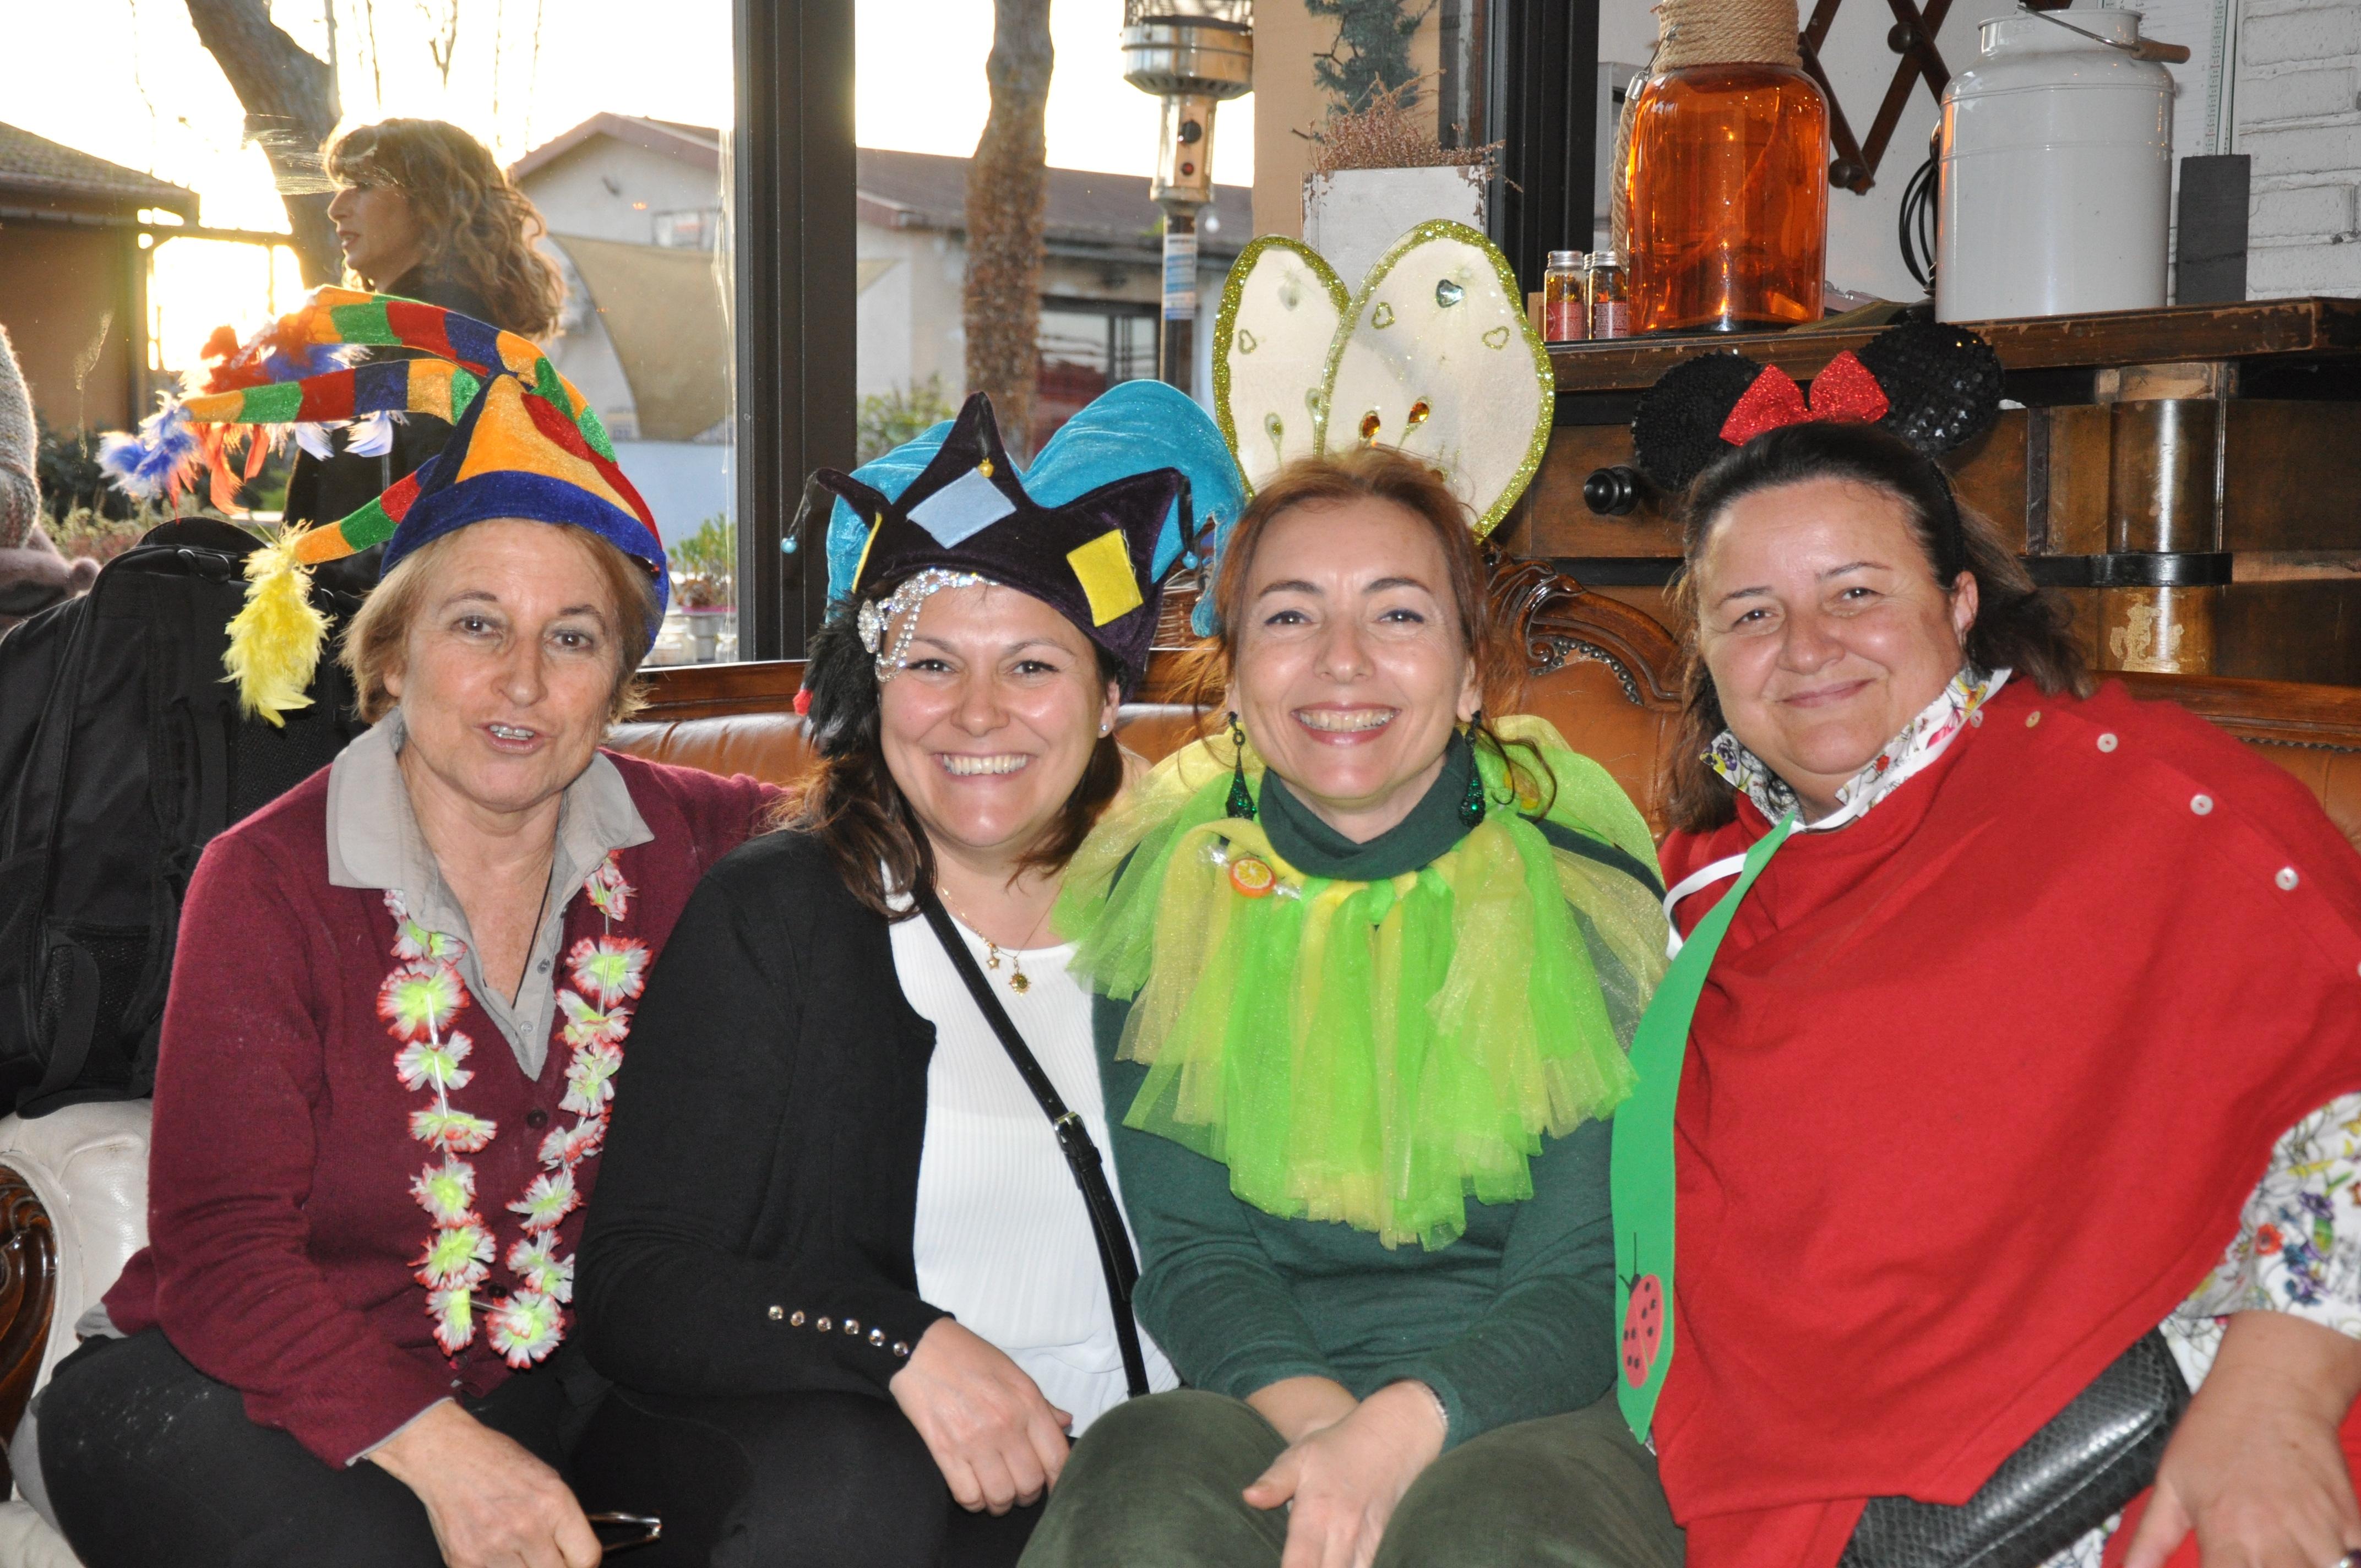 Burraco di Carnevale ai Pinispettinati